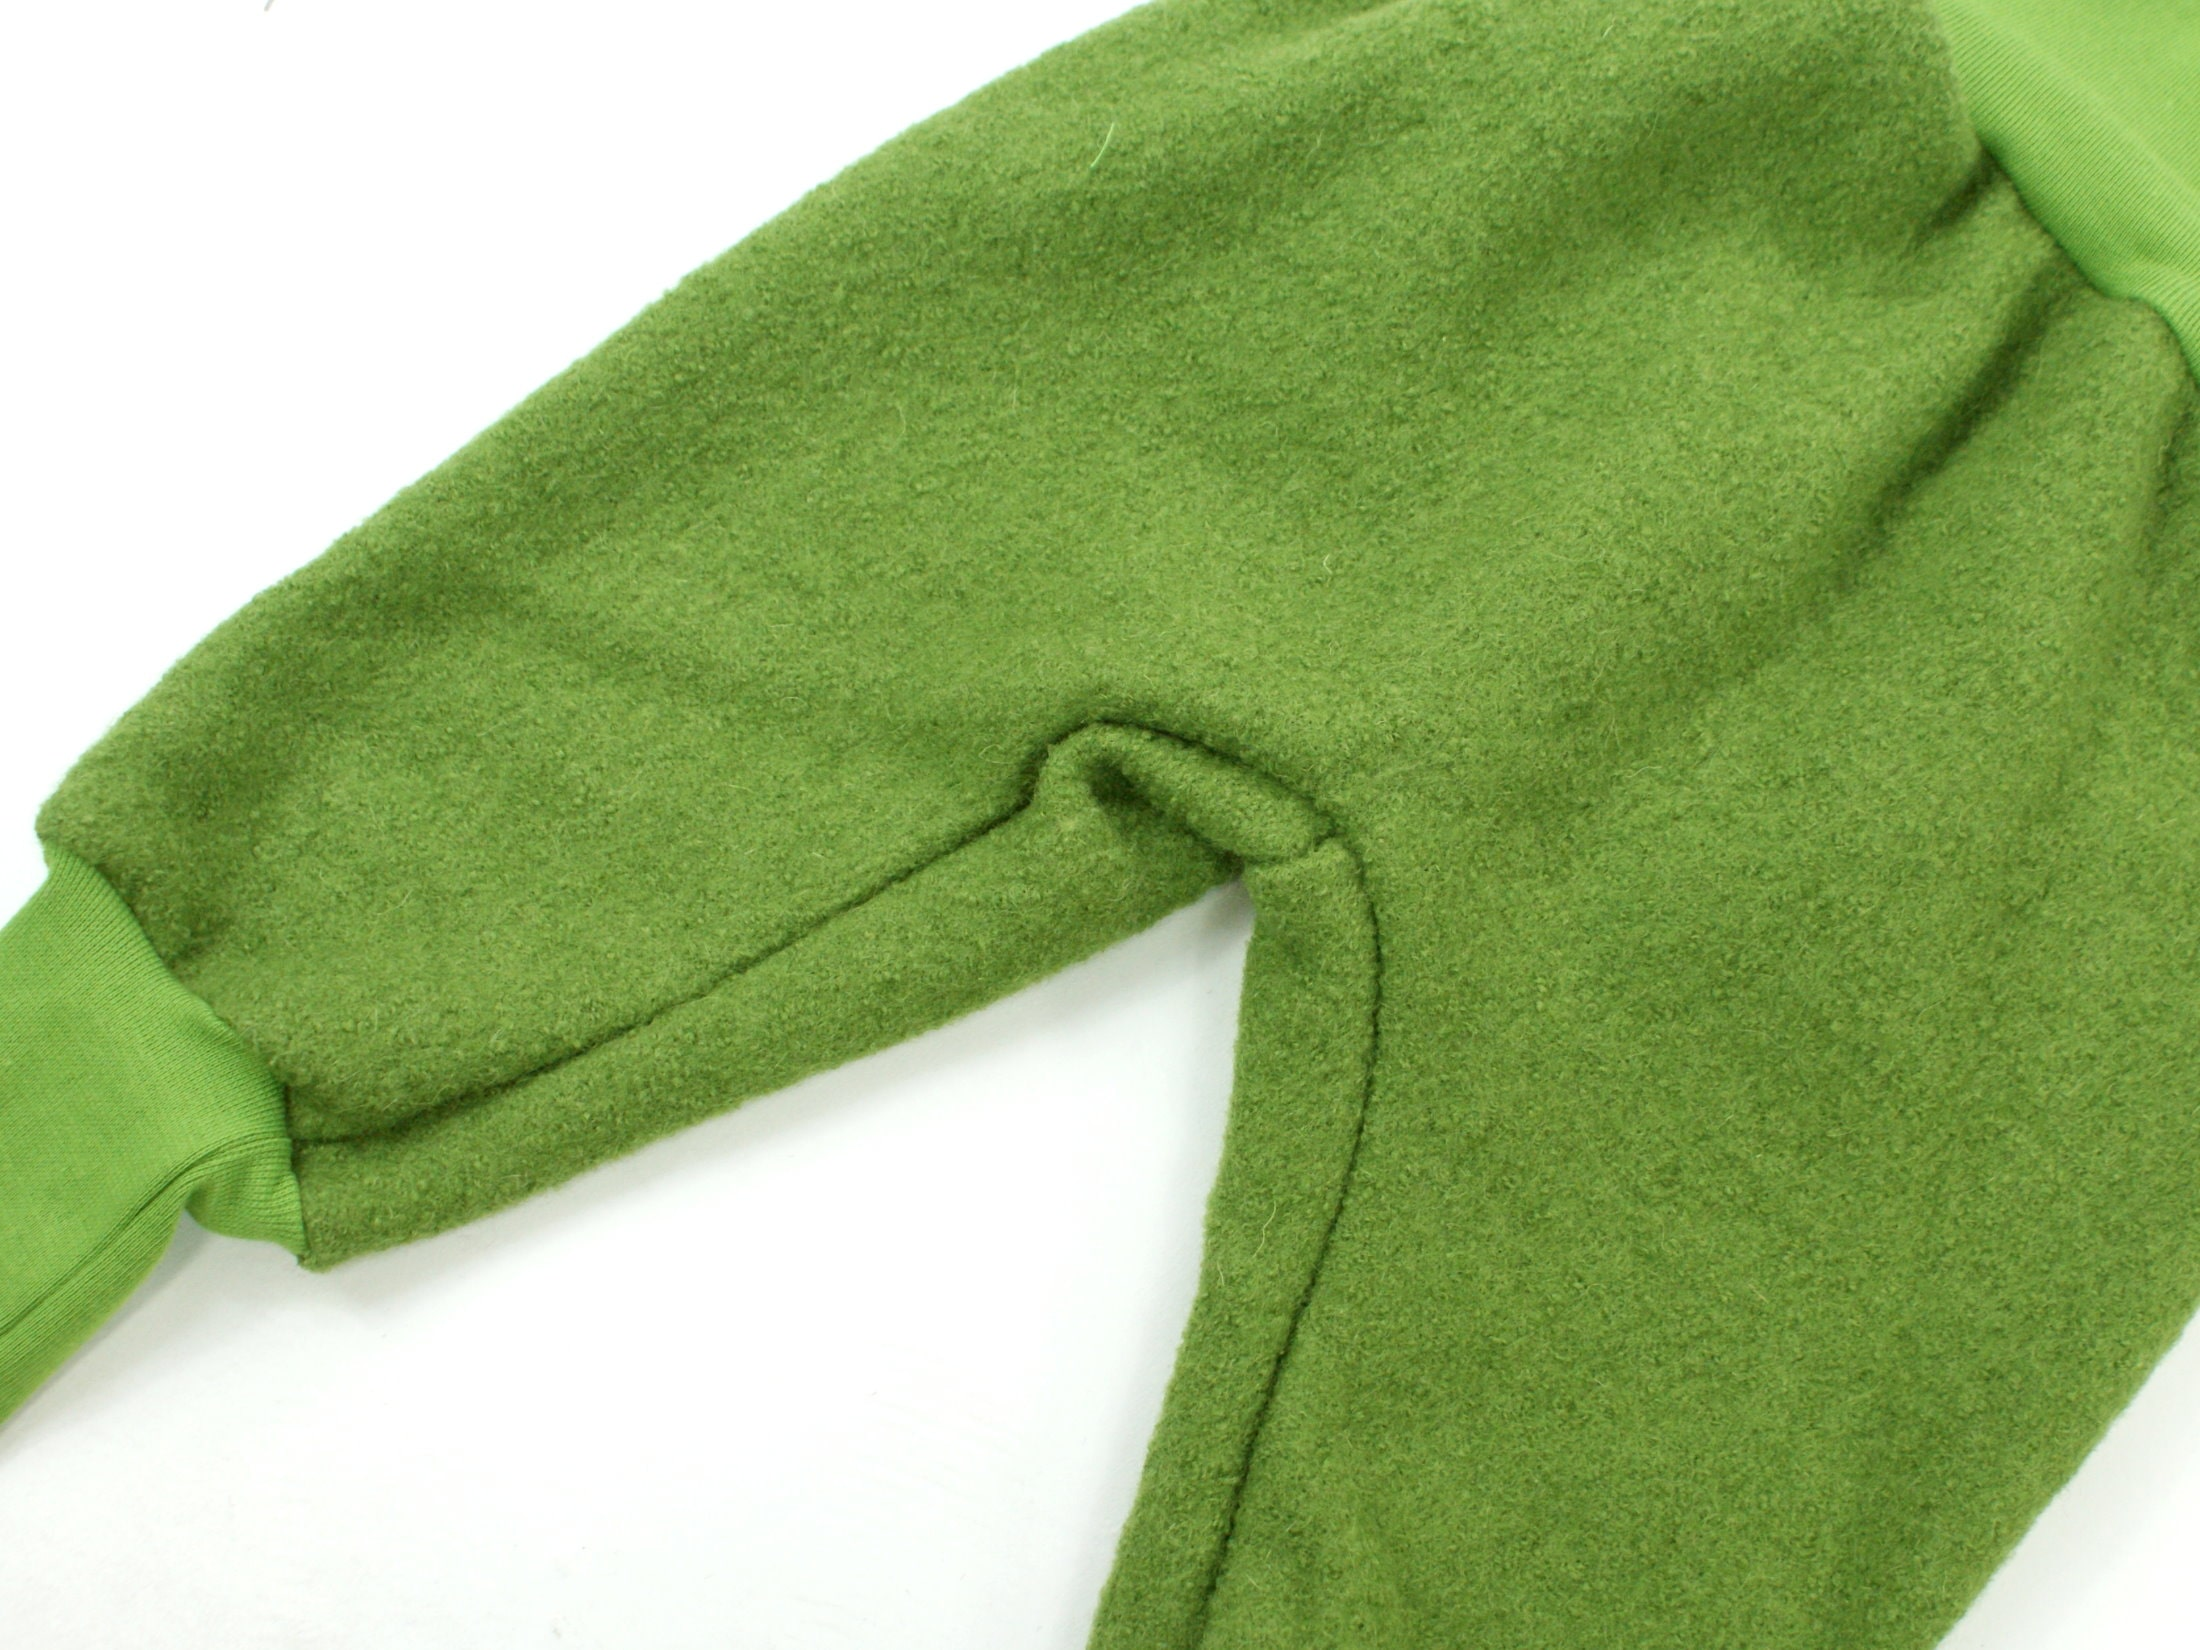 Walkhose Pumphose aus Wollwalk in Grün